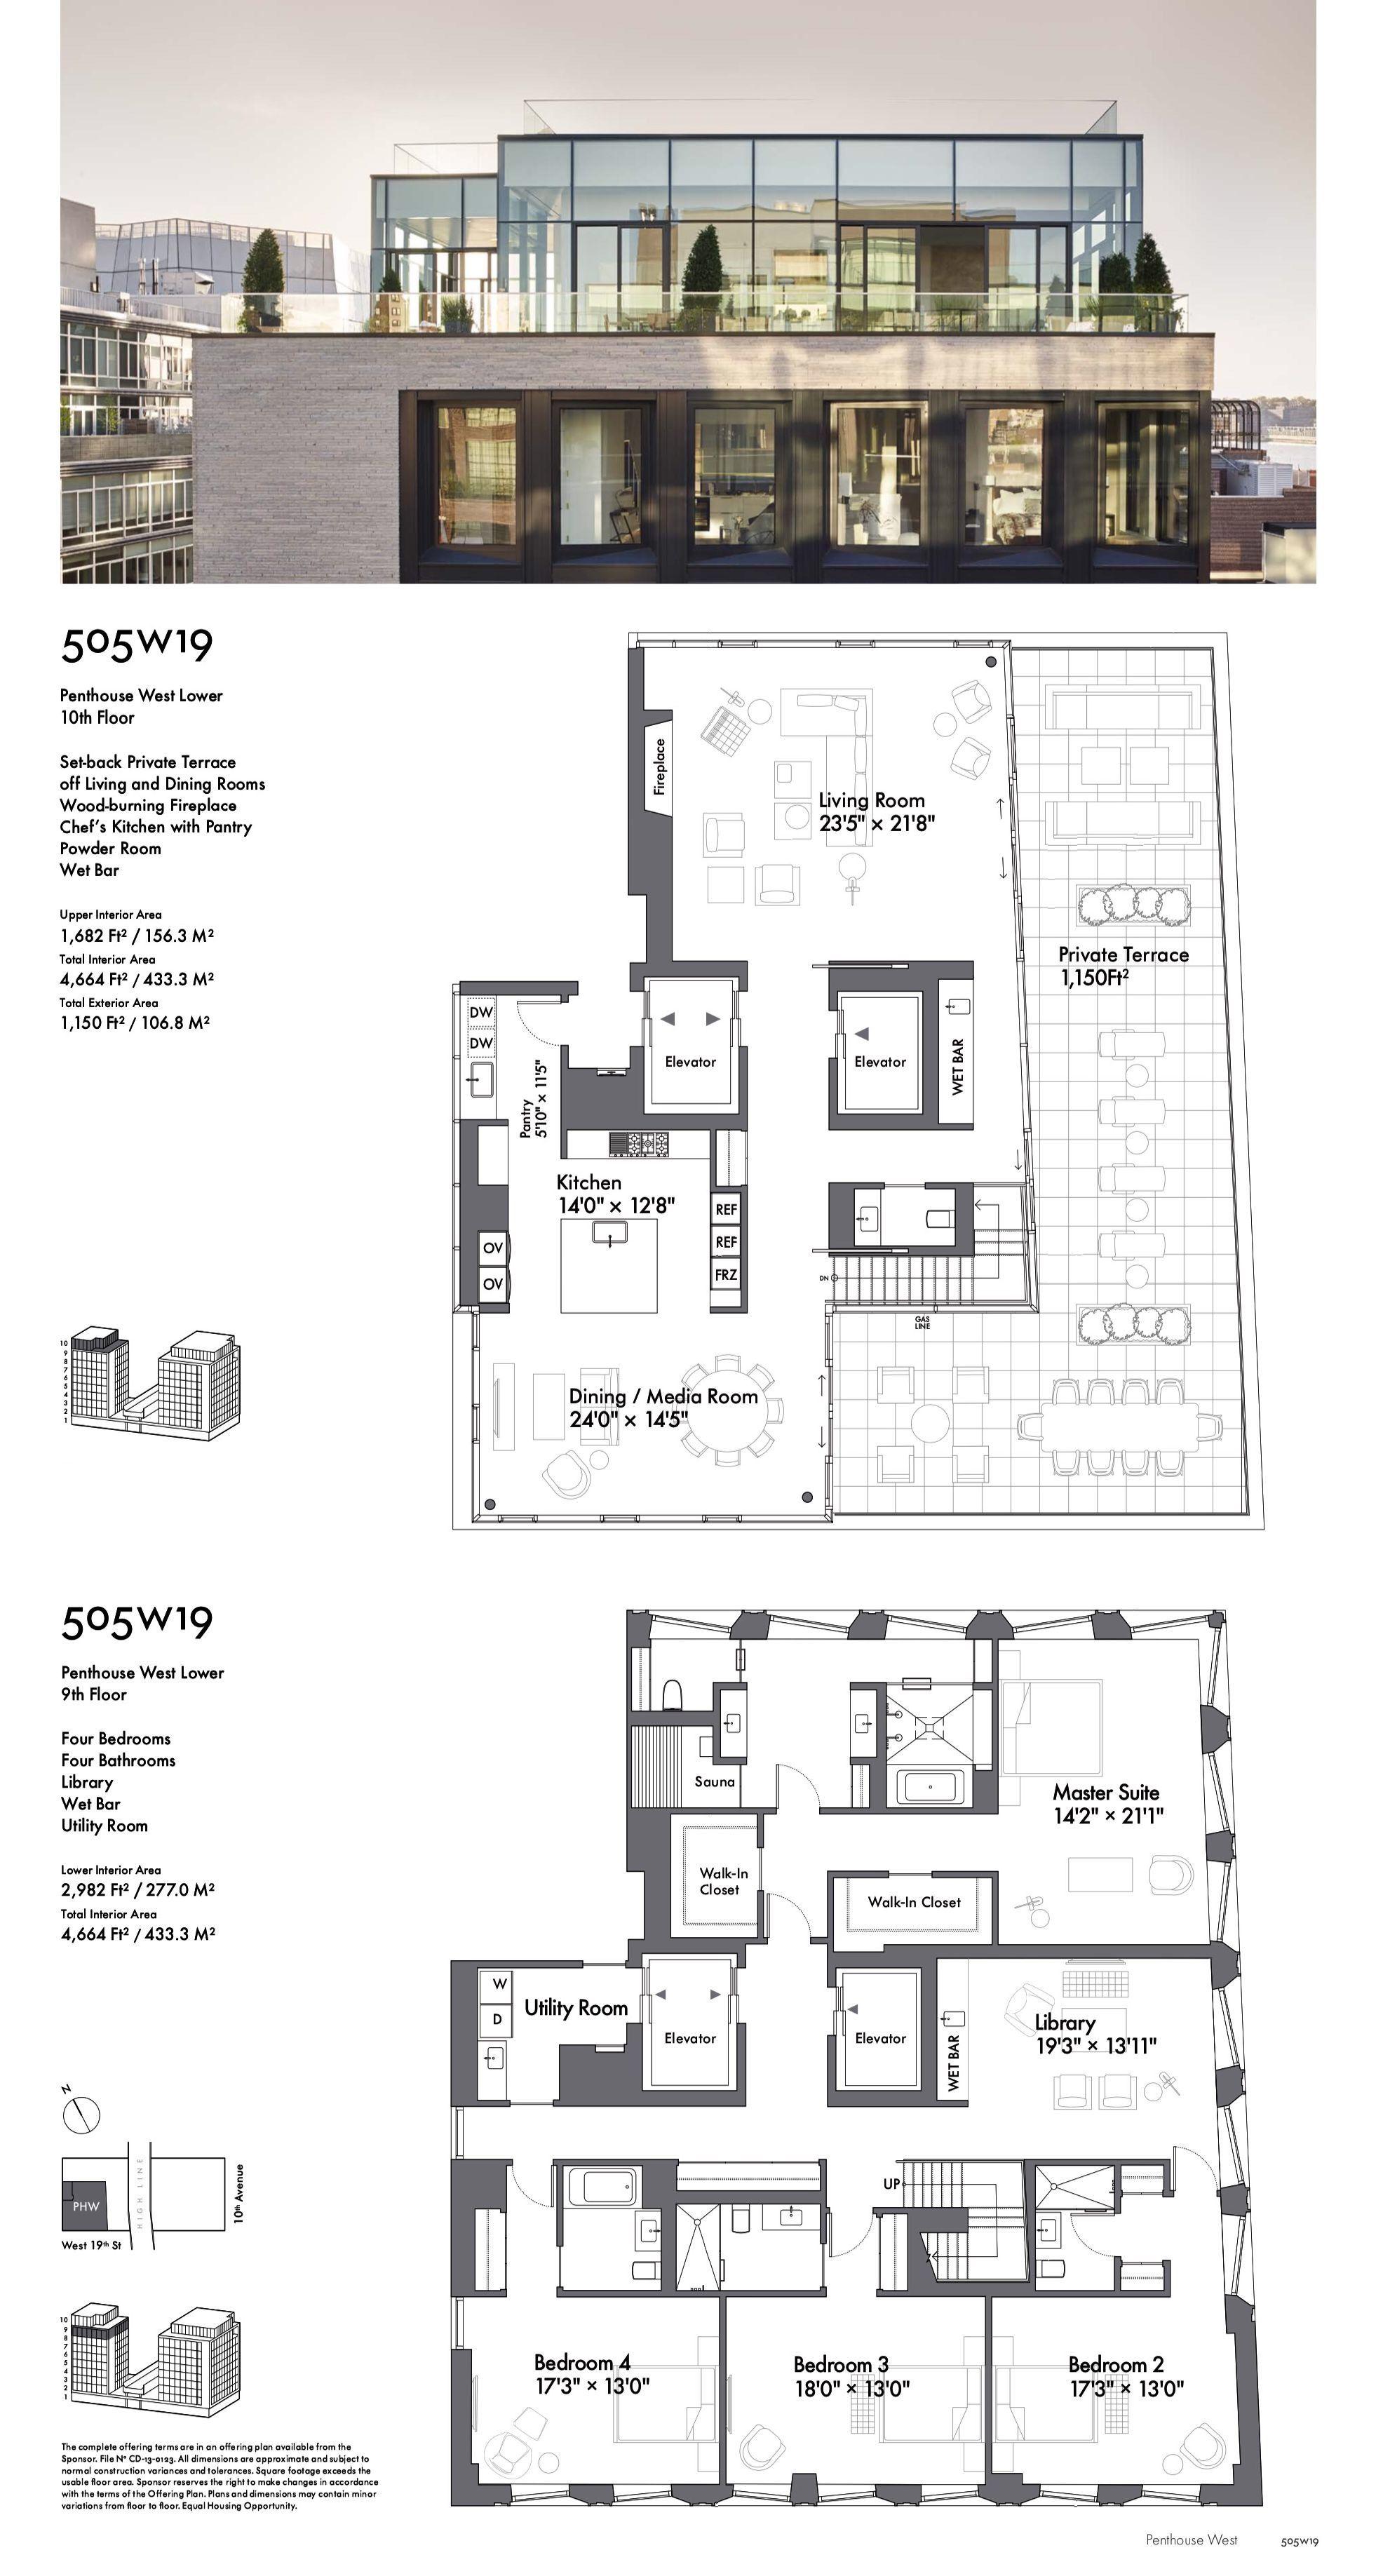 505 West 19 Street Penthouse West House Blueprints Arsitektur Modern Tata Letak Rumah